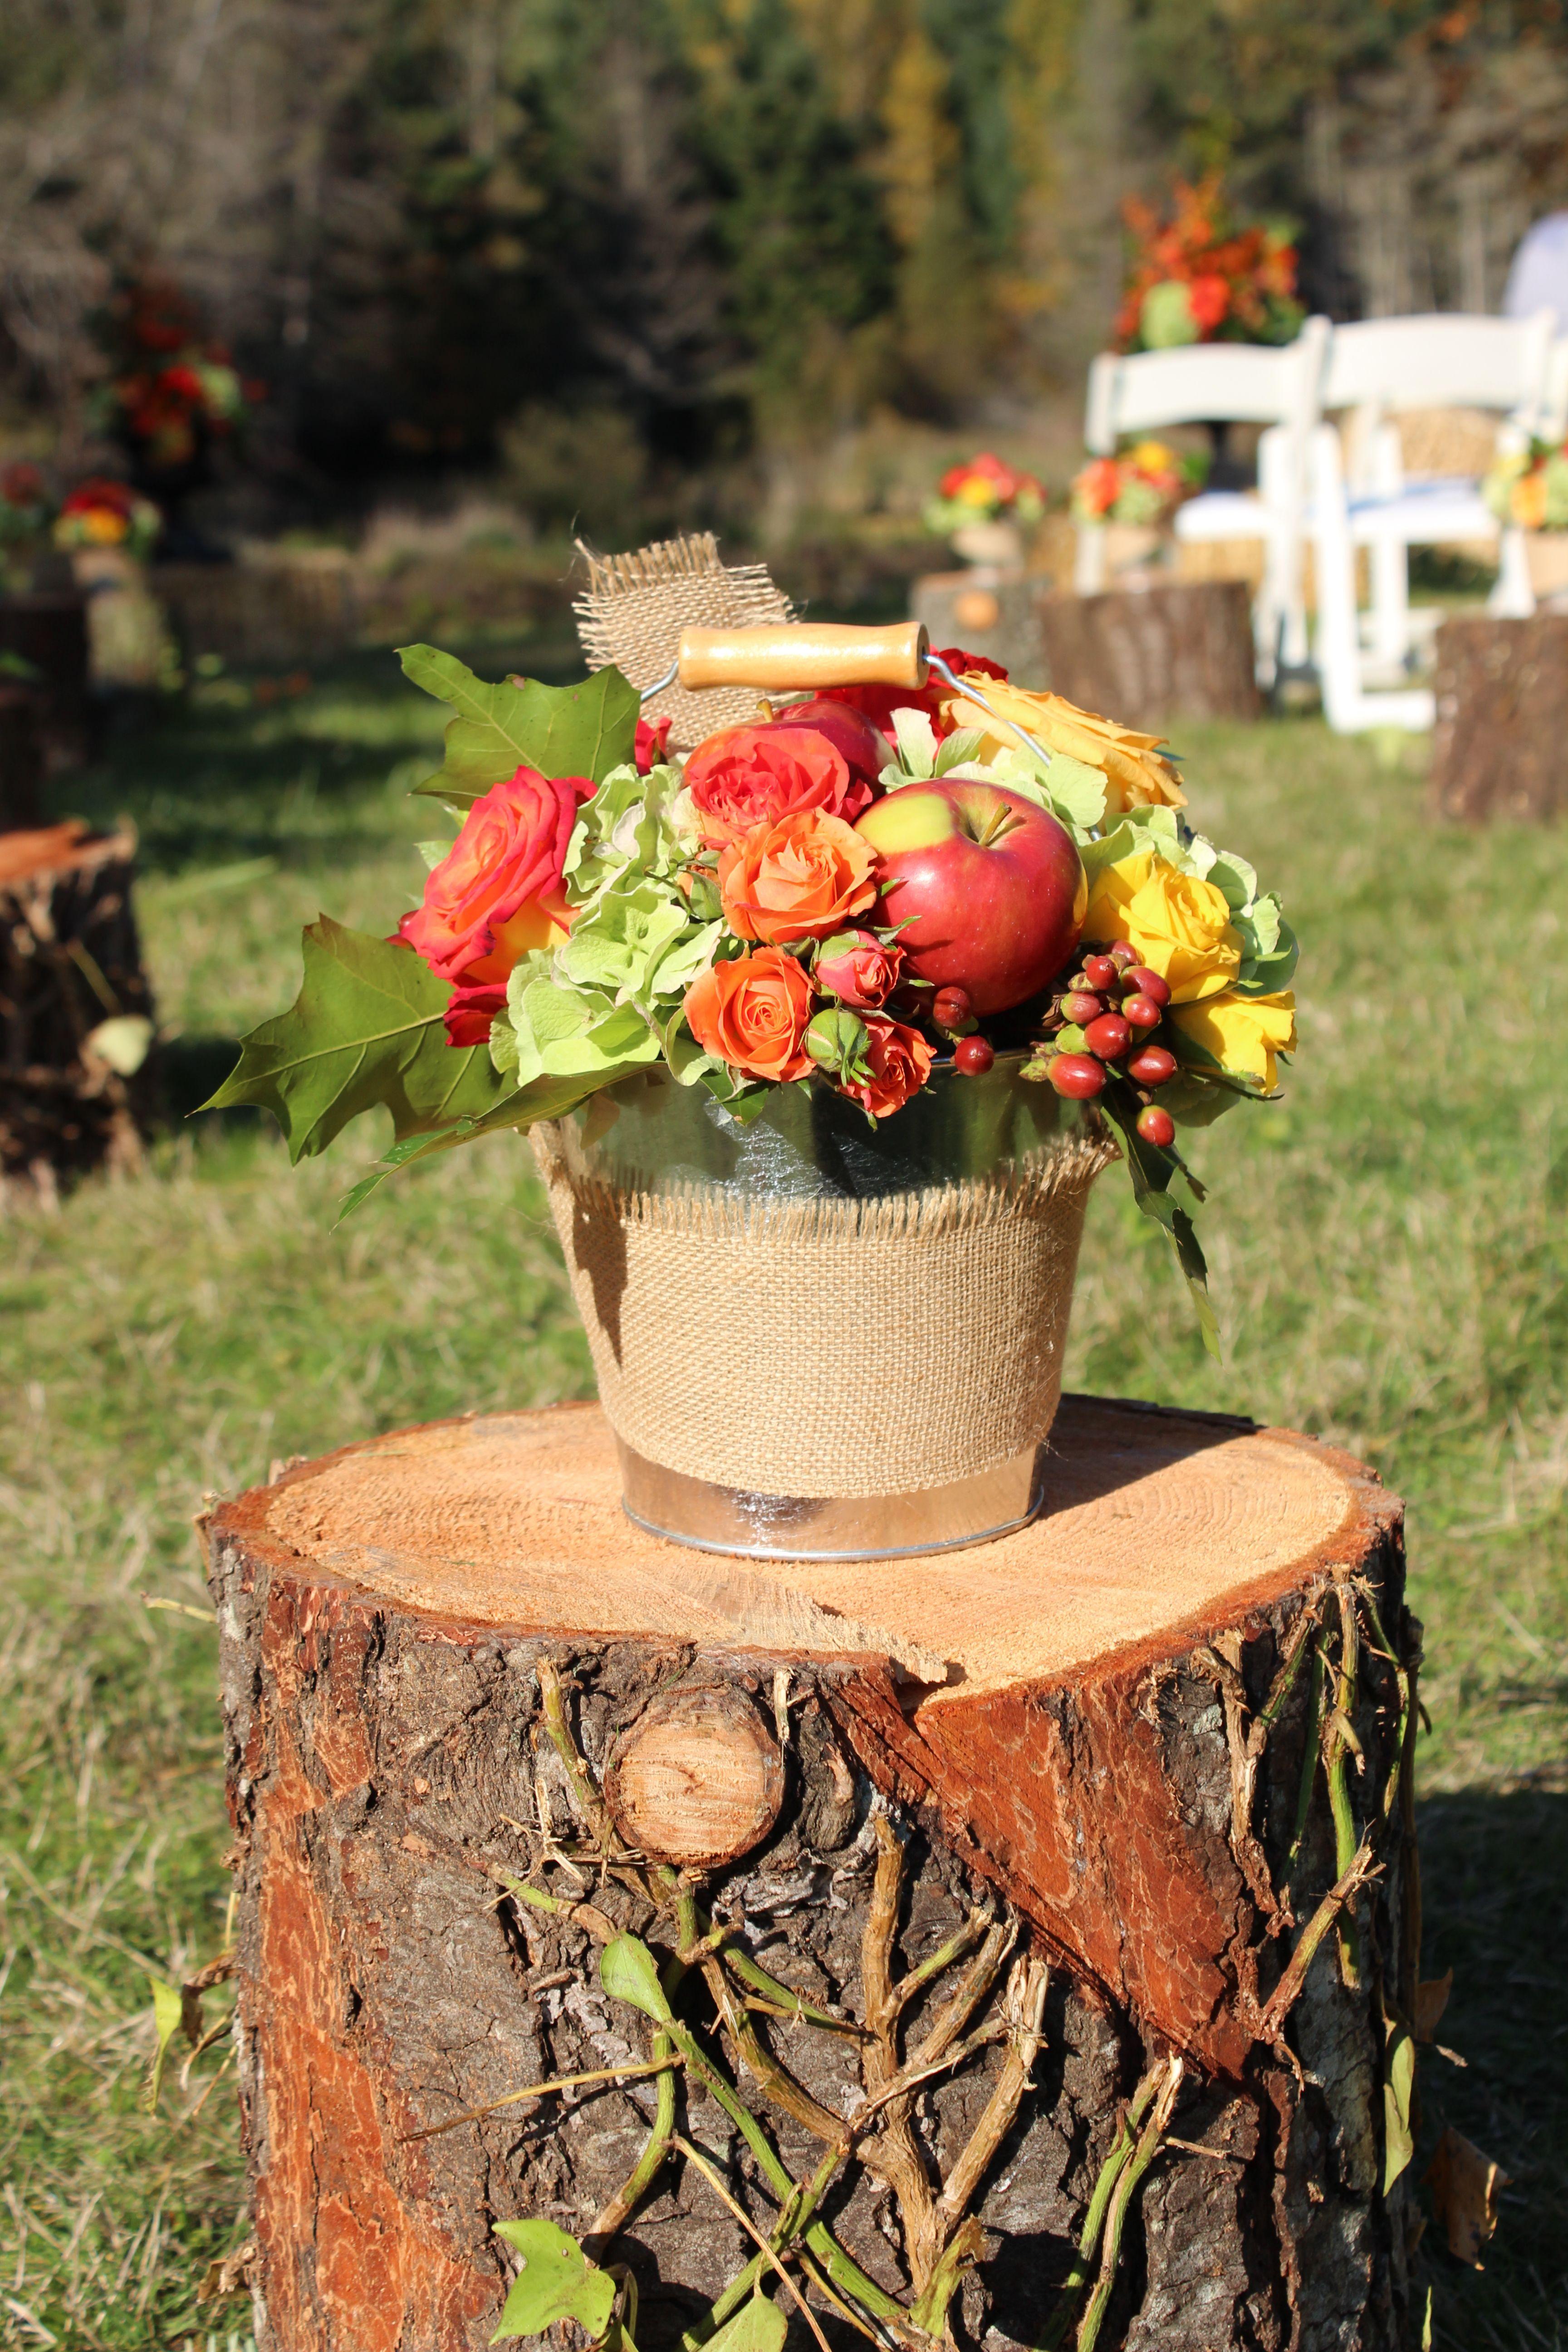 Outdoor fall wedding decor  Outdoor autumn wedding  aisle markers  Rustic wedding  Pinterest